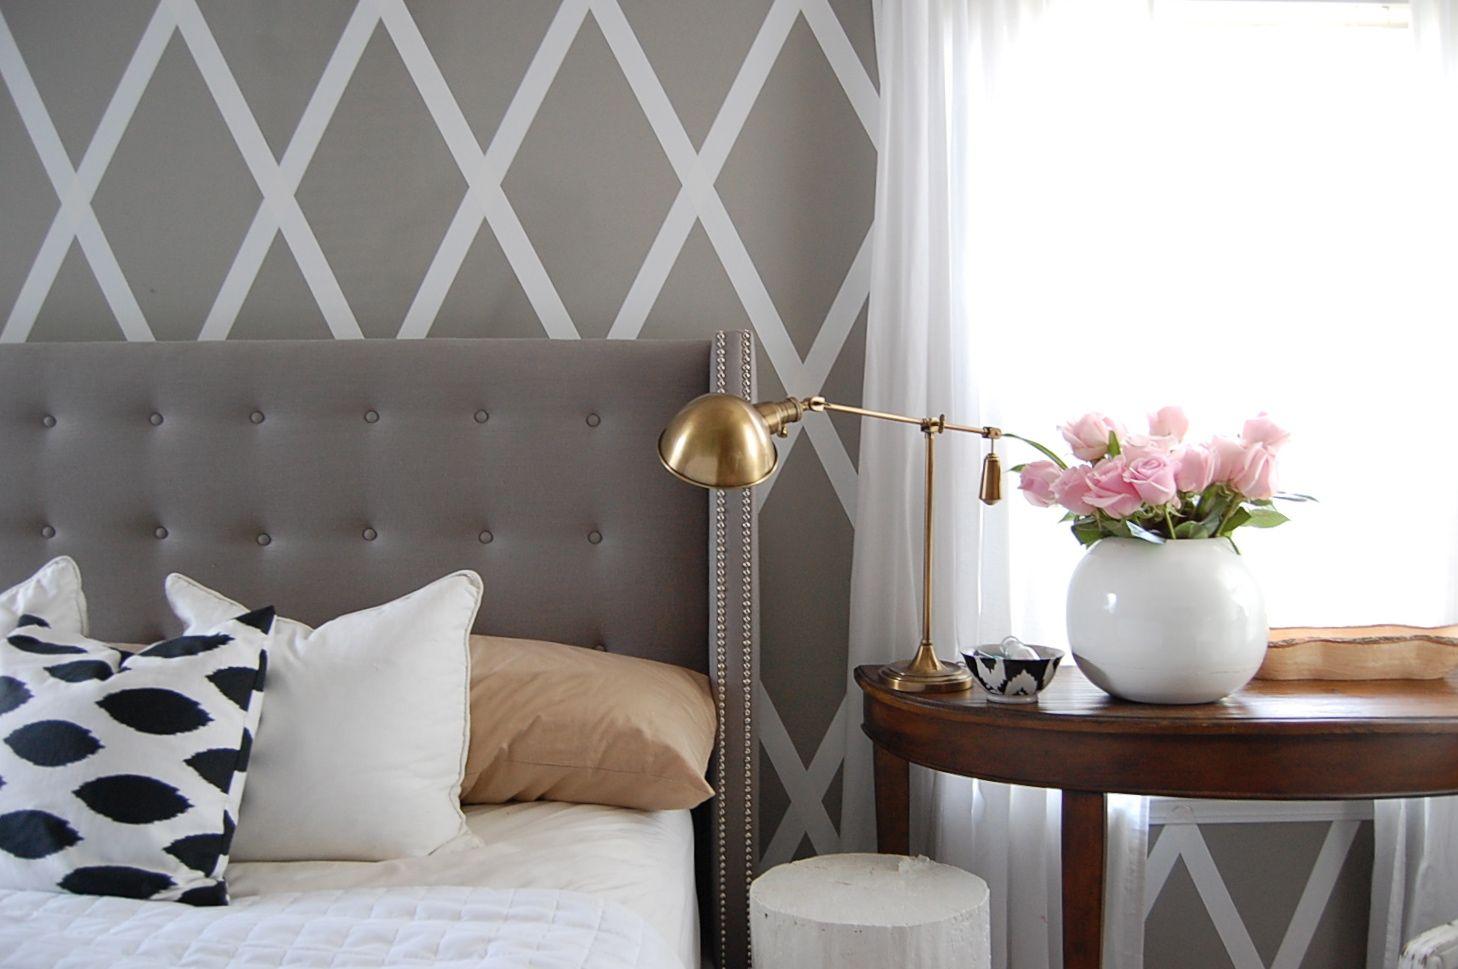 No Paint Diamond Wall | Diy wall decor, Home decor, Wall ...